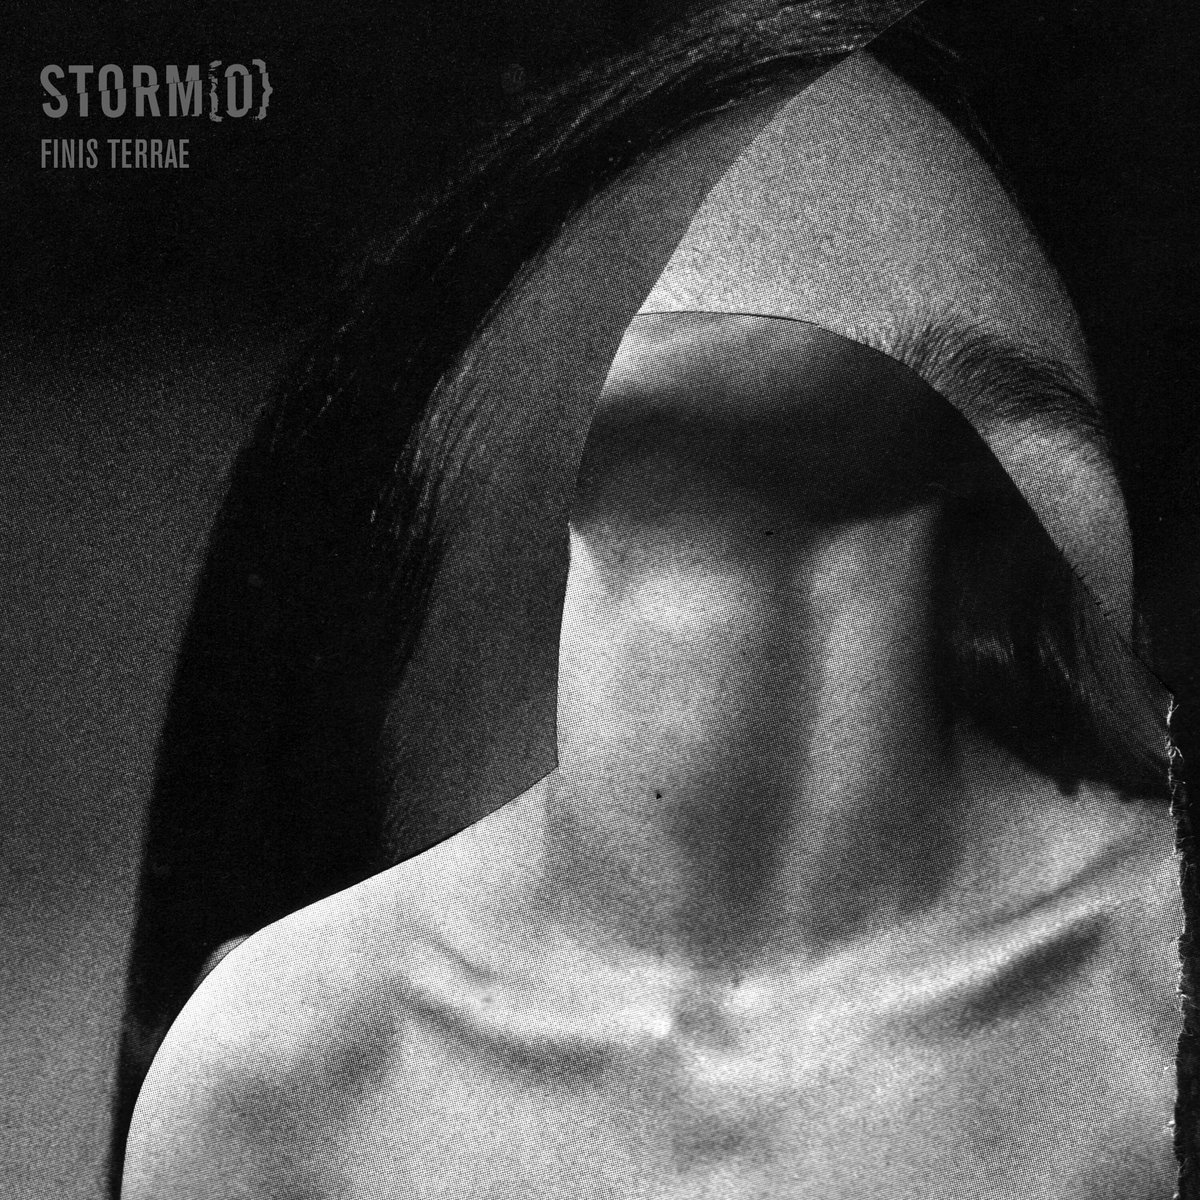 Storm O - Finis Terrae